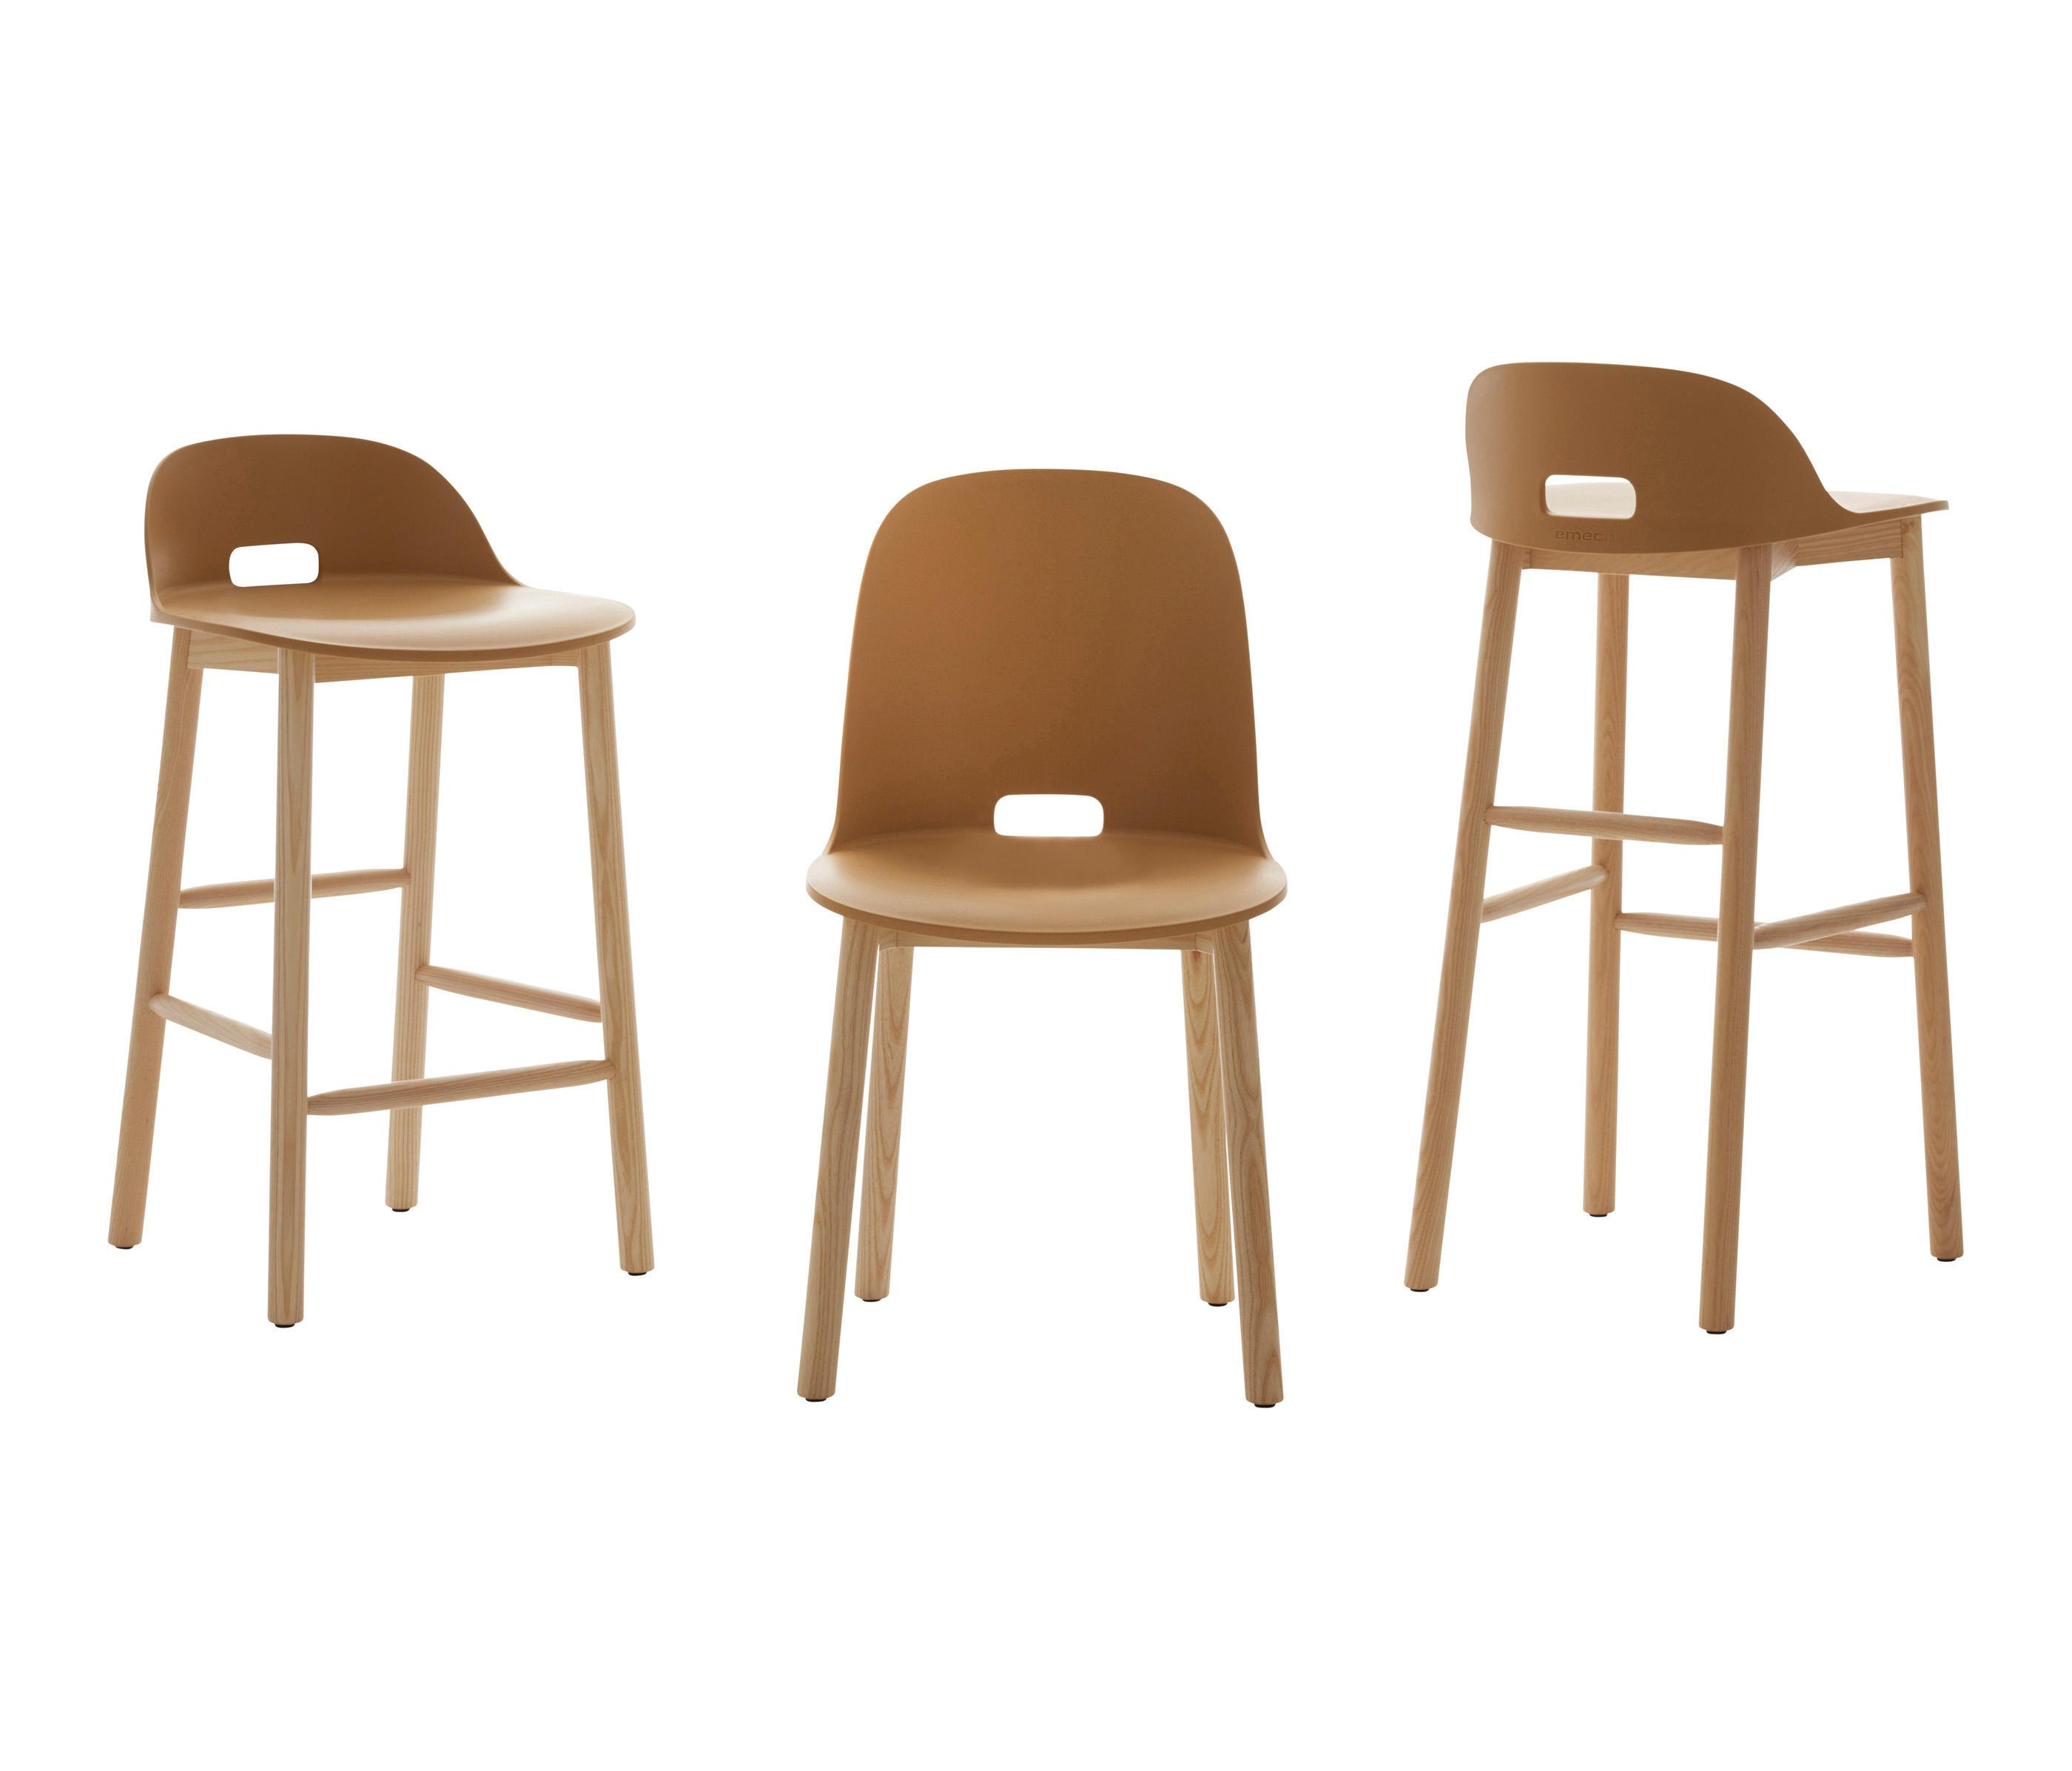 barstools stools back kitchen b with home amazon bar furniture high uk stool co woltu